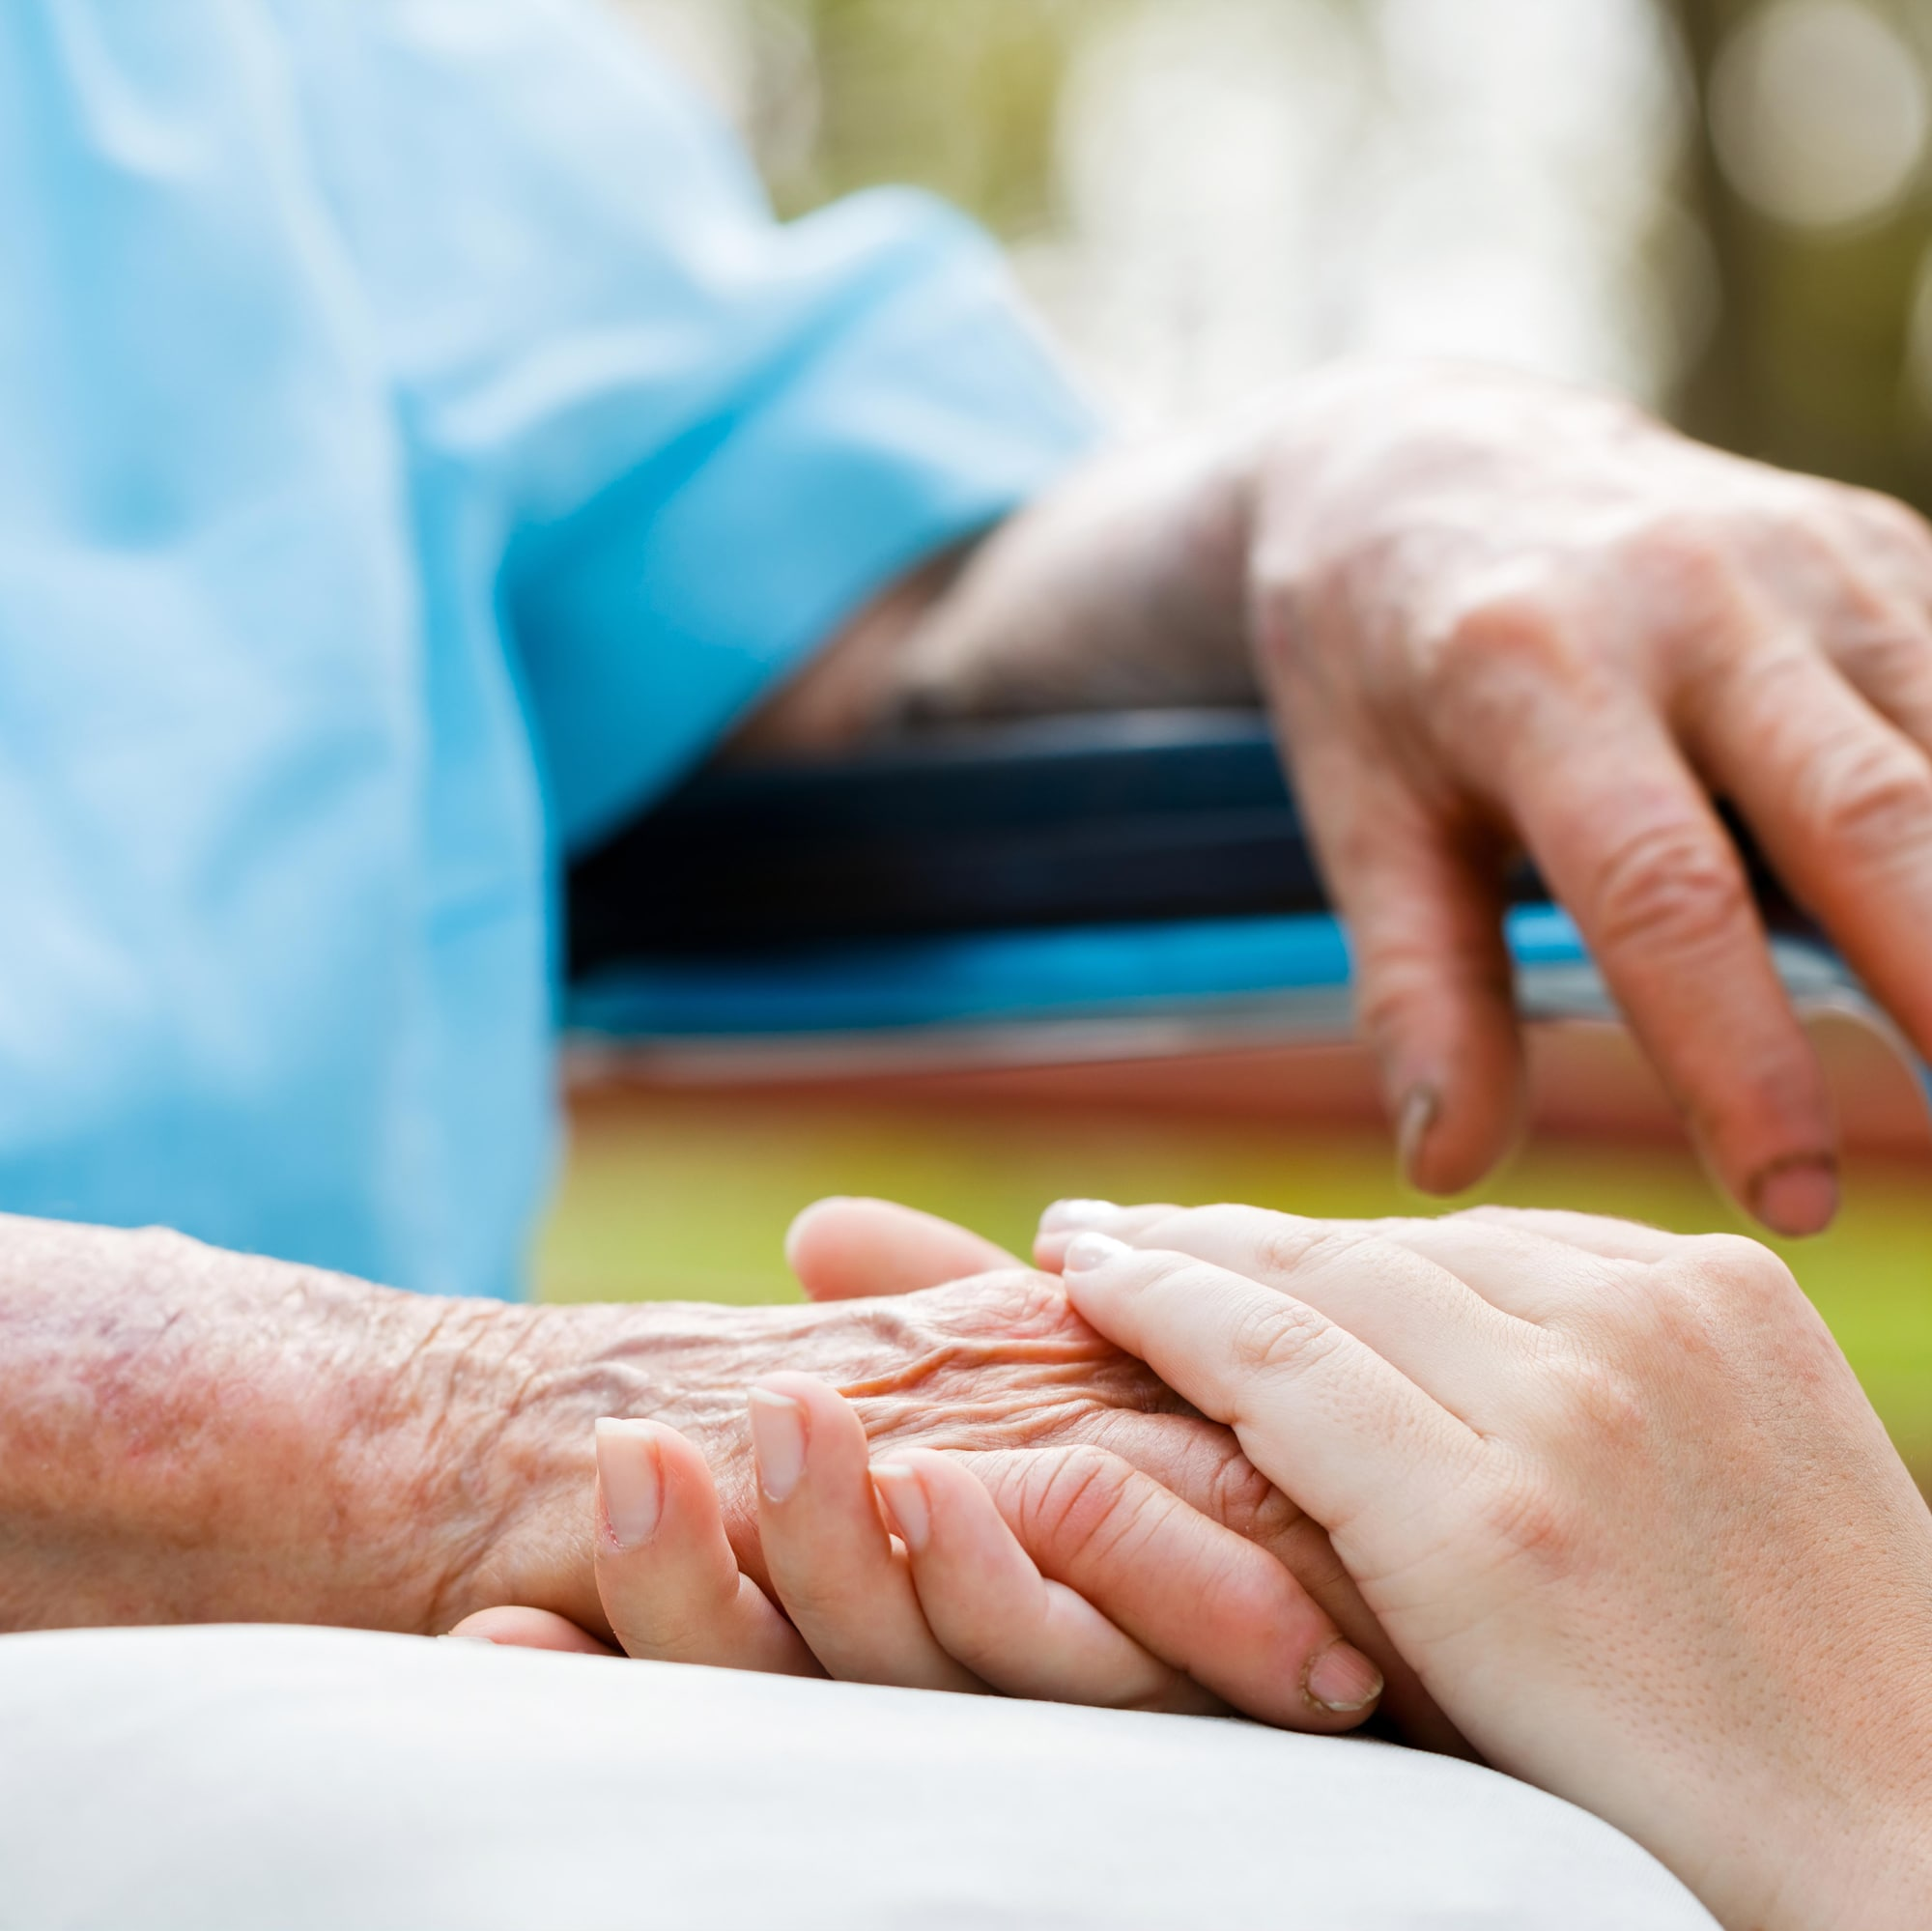 Elderly and sick people